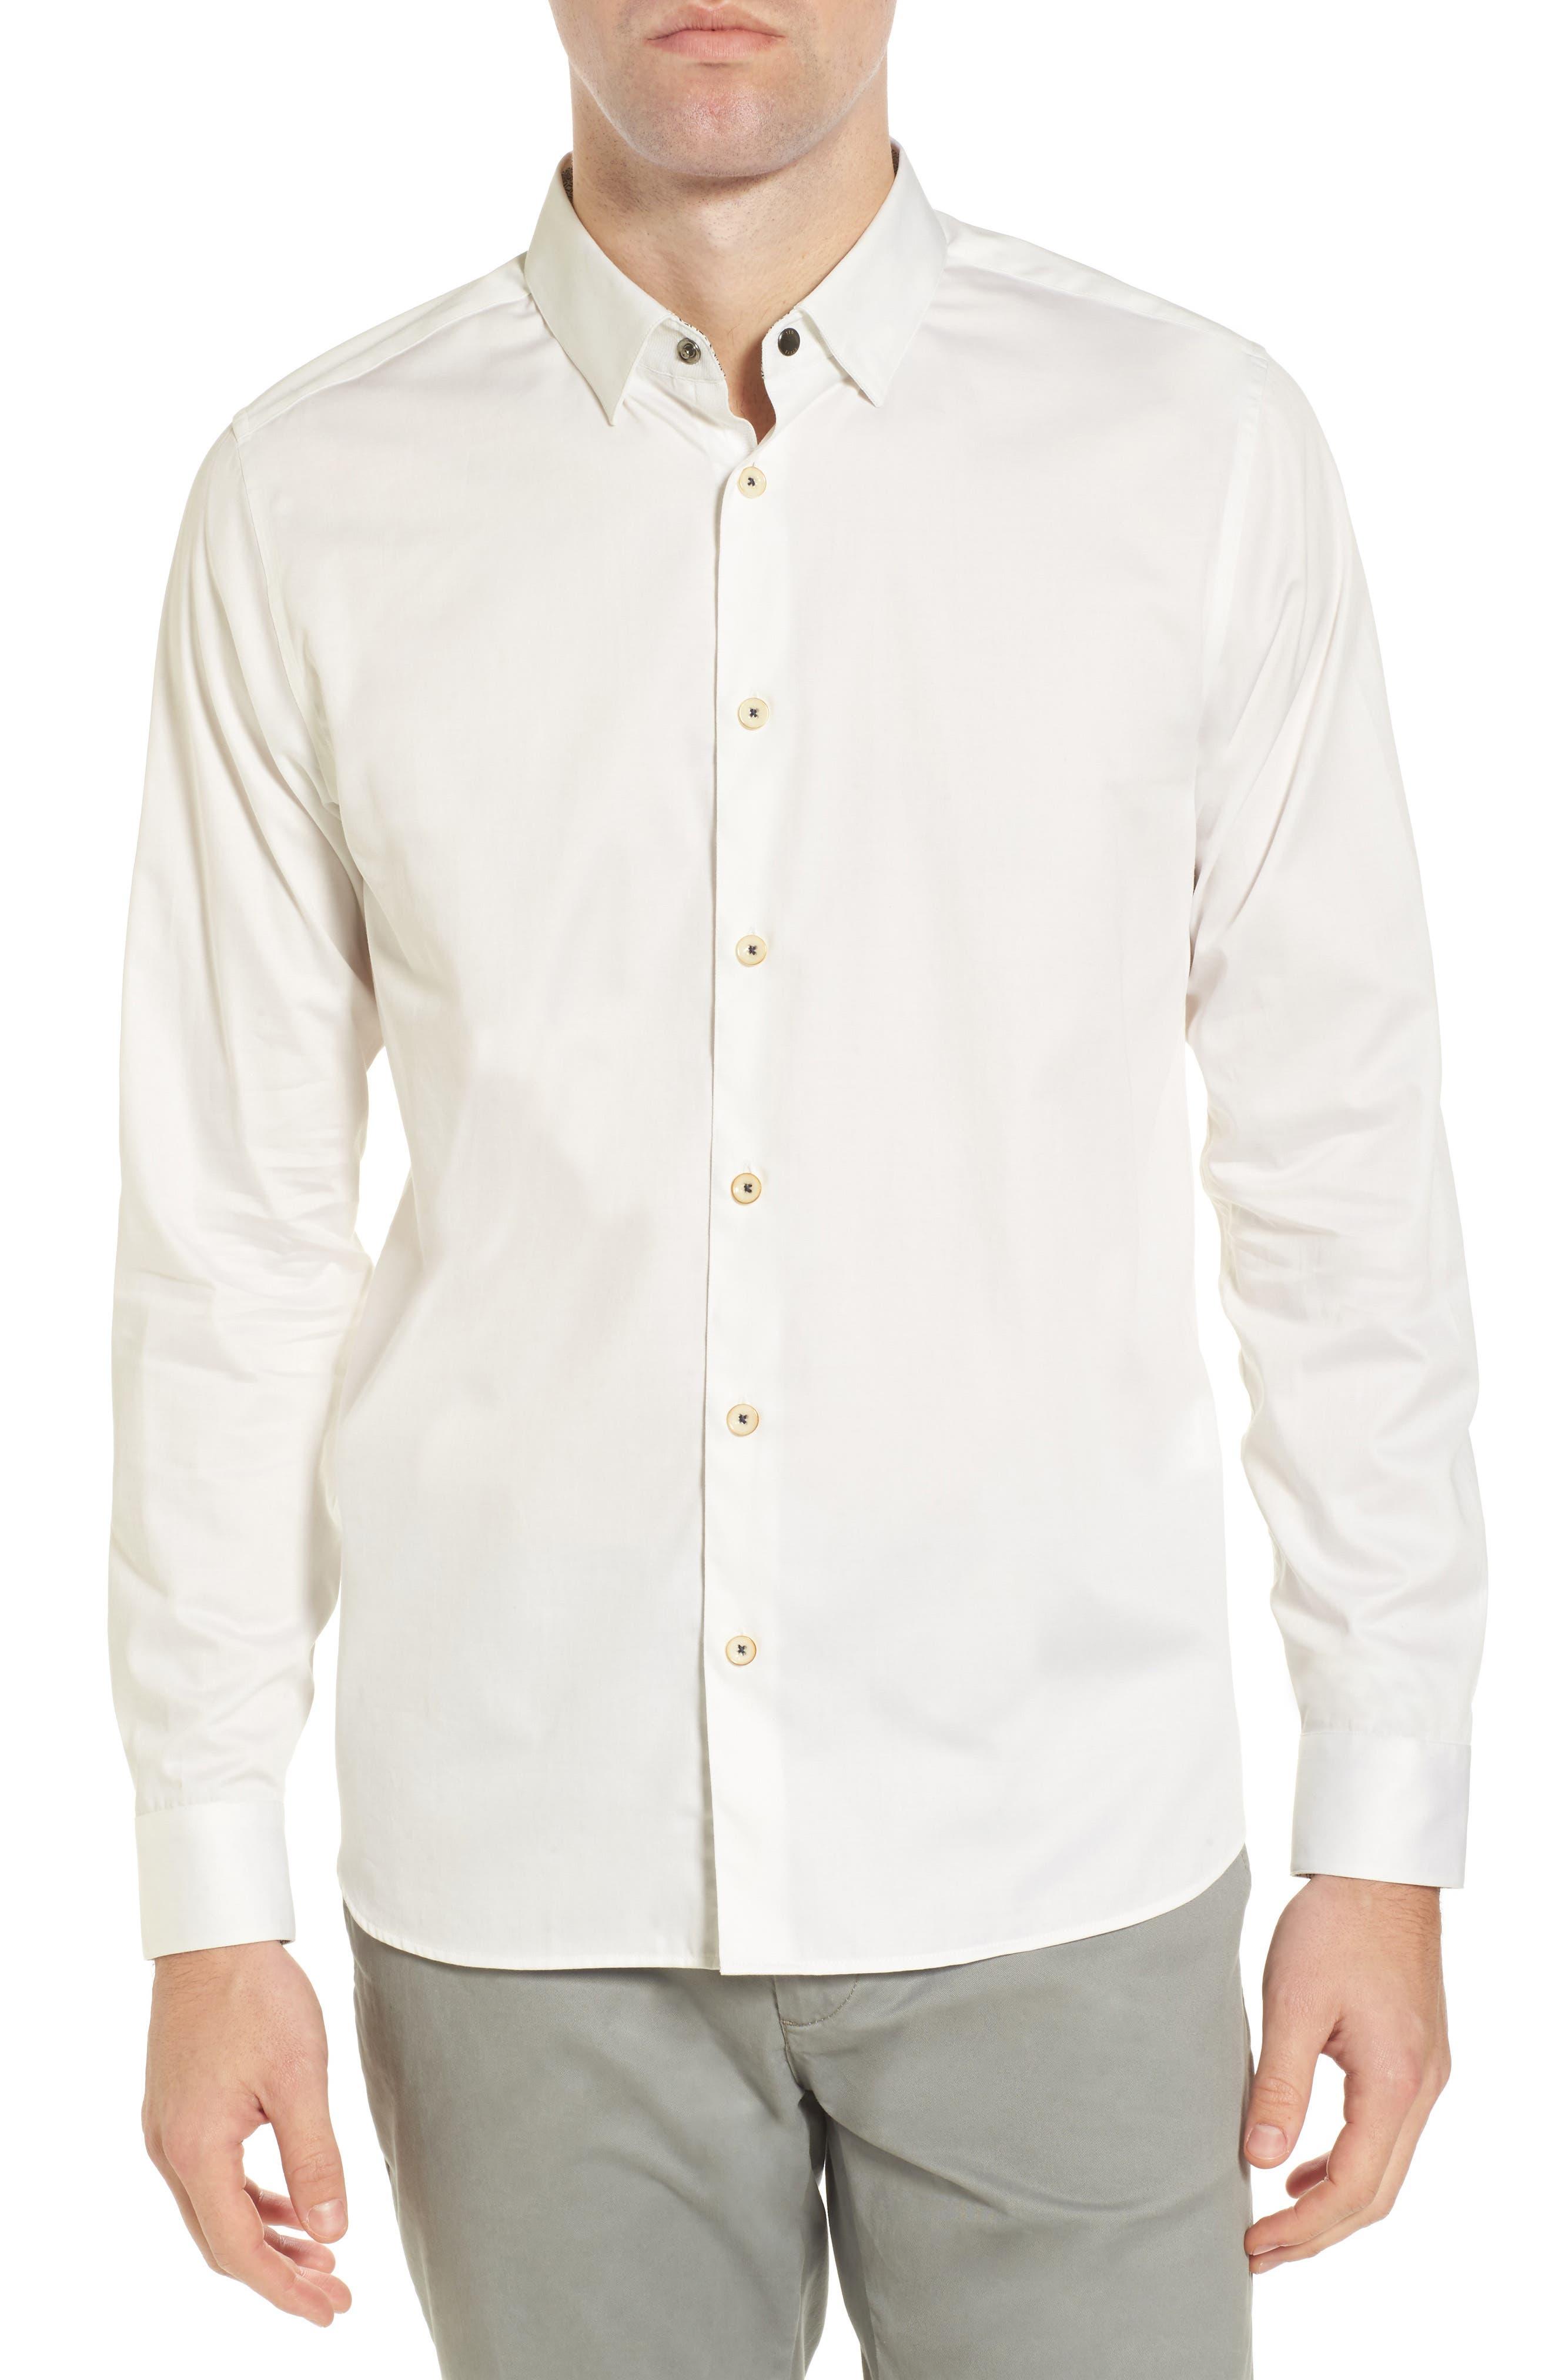 Byllytt Extra Slim Fit Stretch Solid Sport Shirt,                         Main,                         color, 100